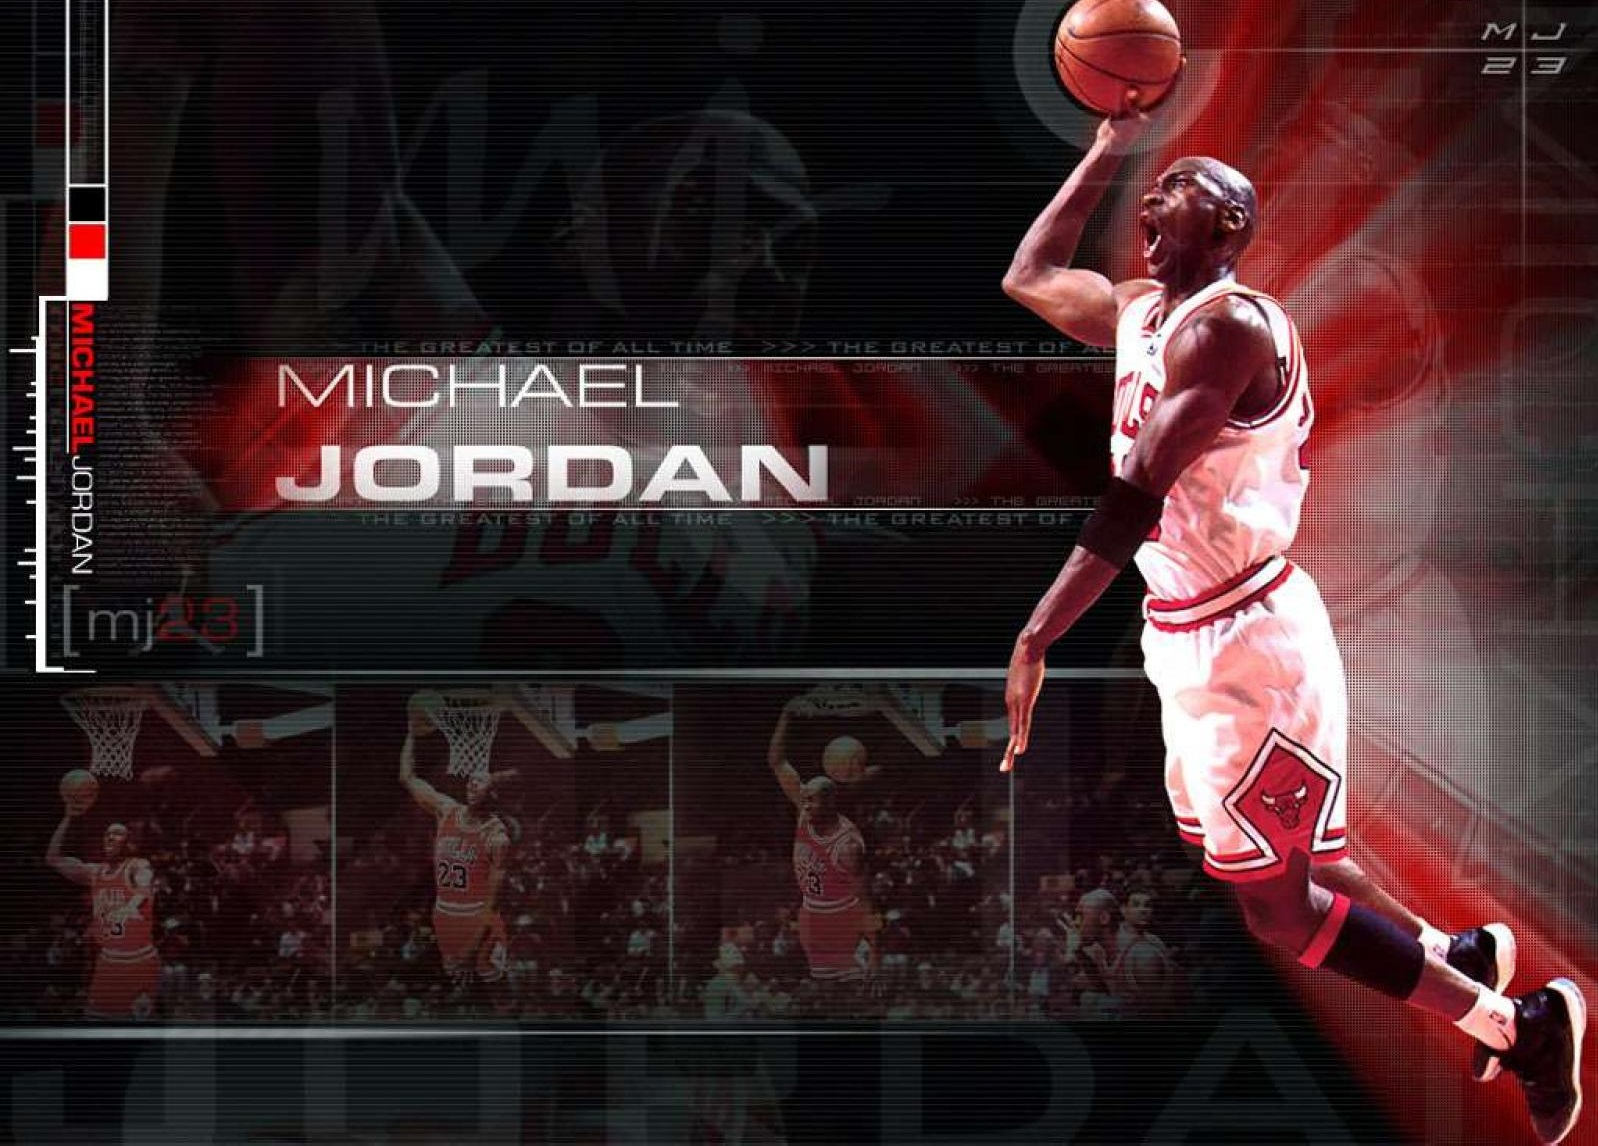 michael jordan wallpaper - photo #13